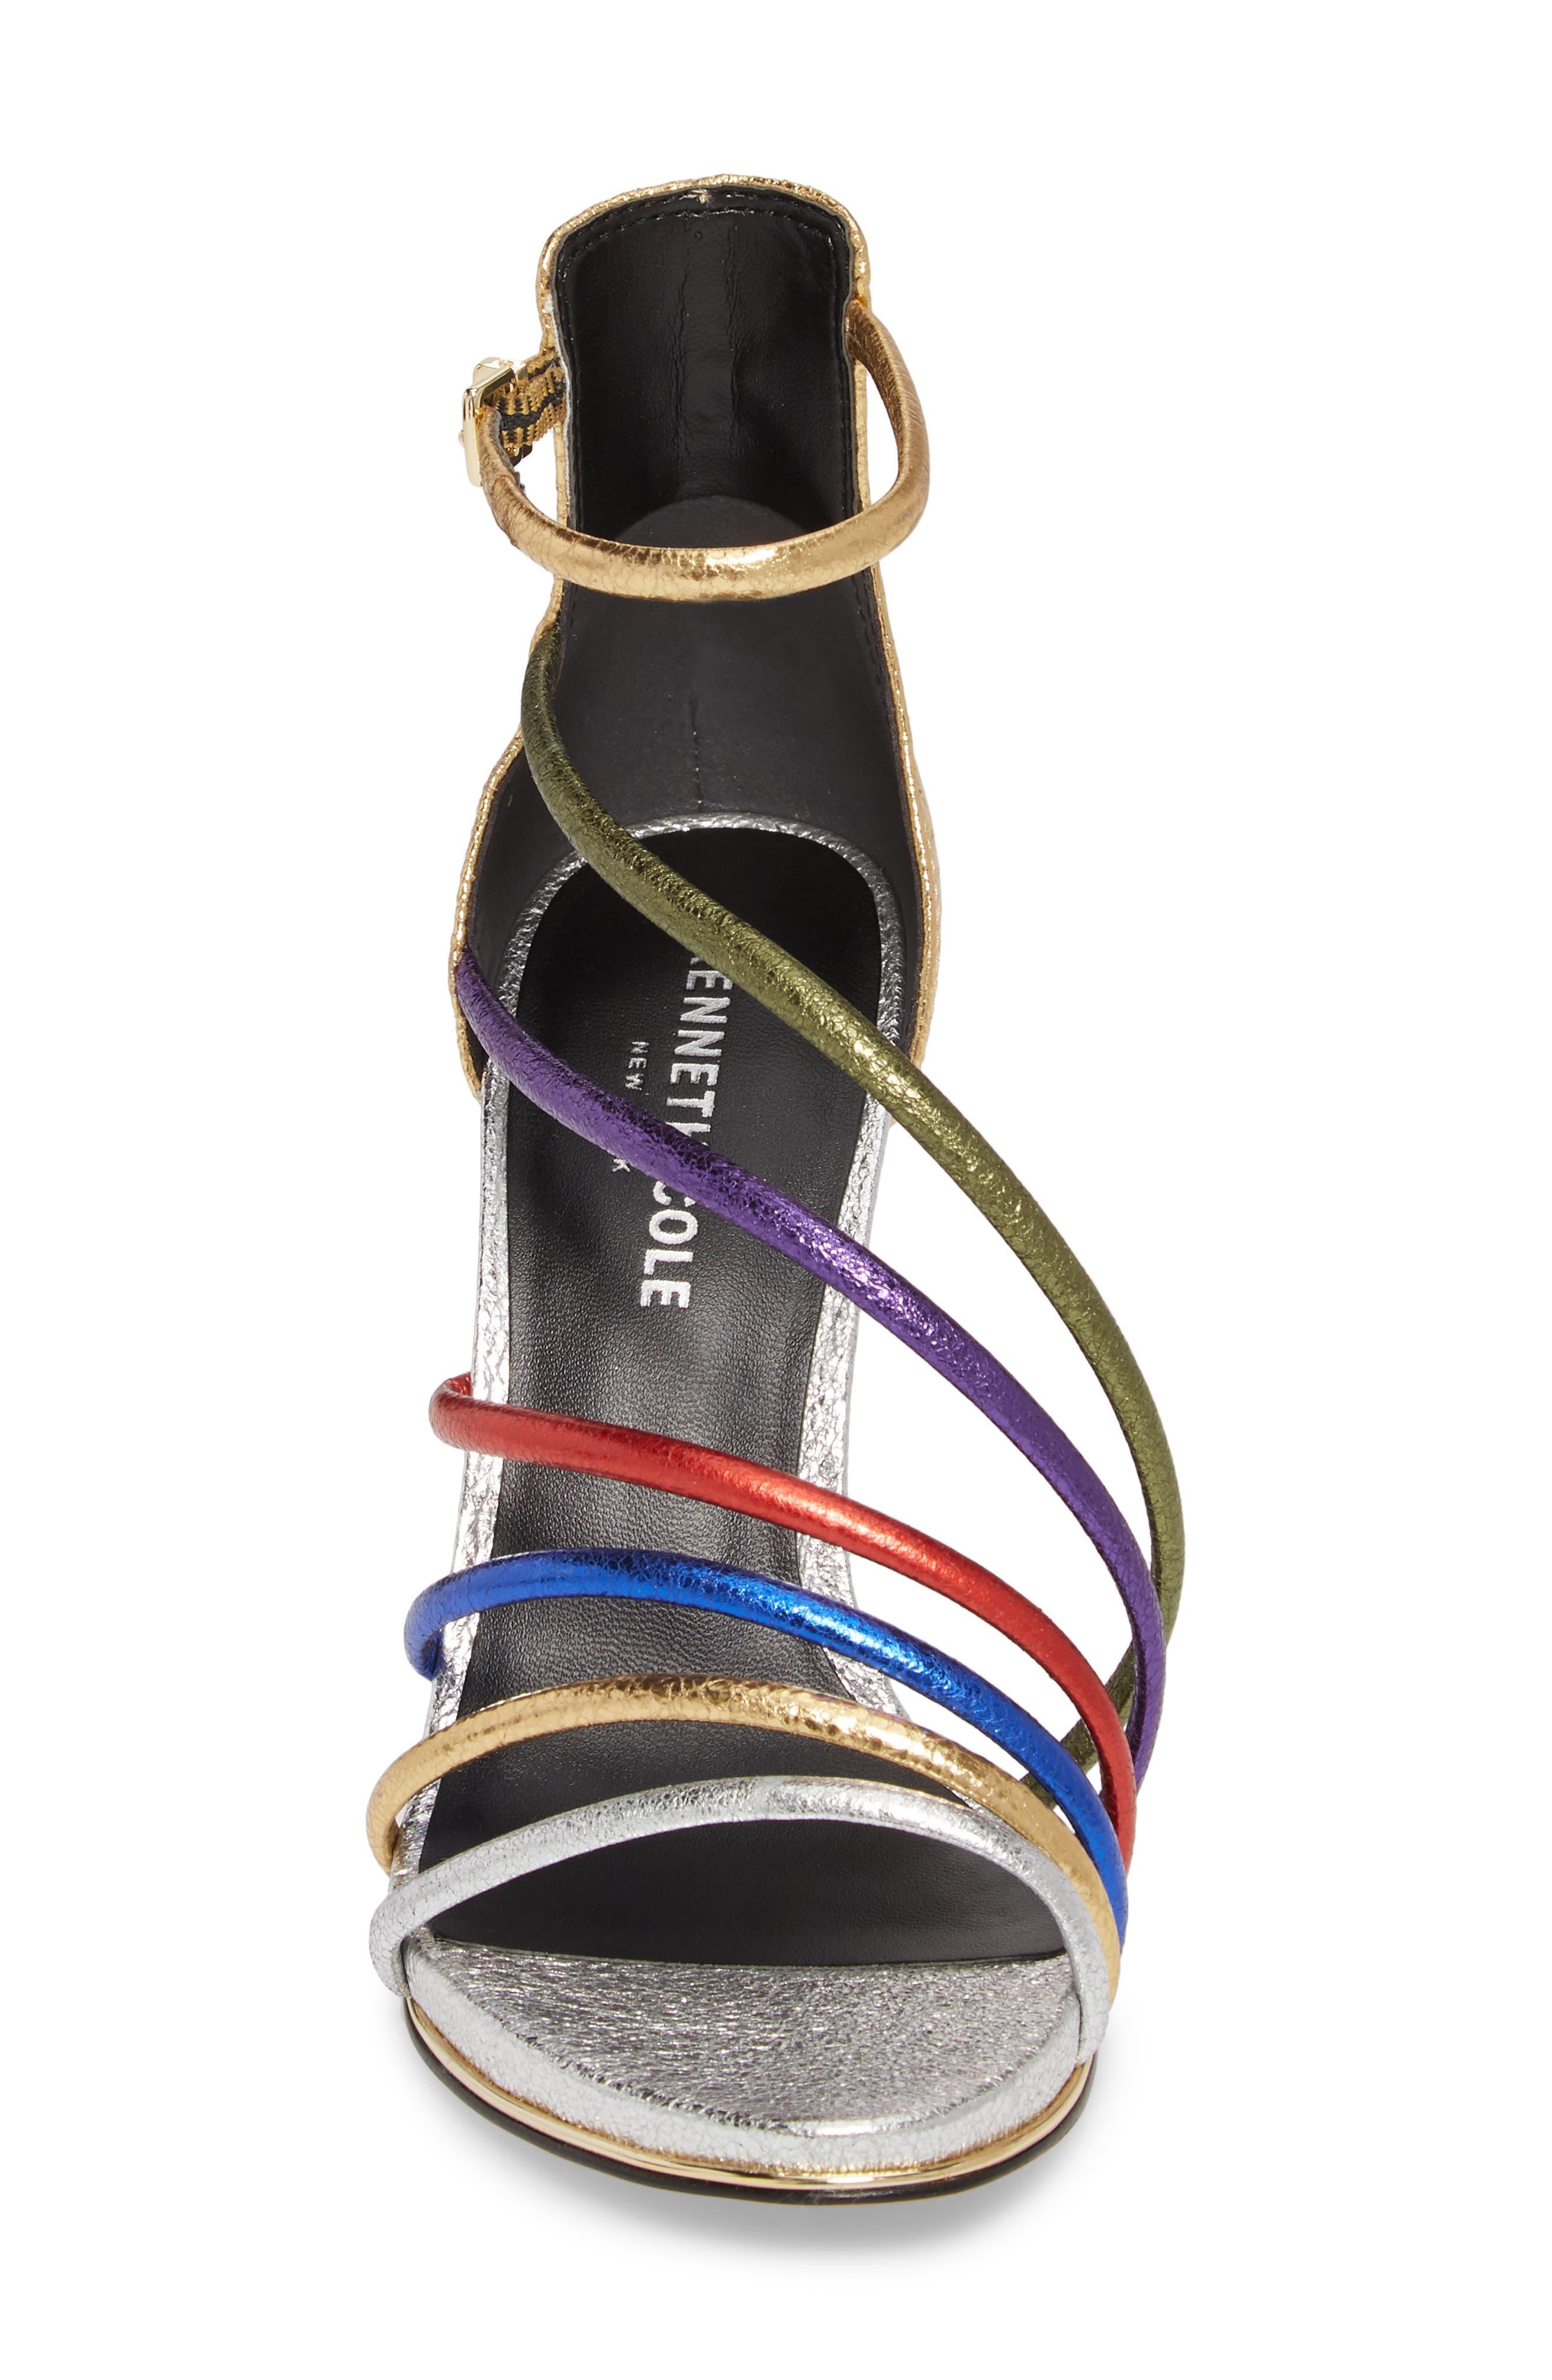 Barletta Asymmetrical Strappy Sandal,                             Alternate thumbnail 4, color,                             MULTI LEATHER